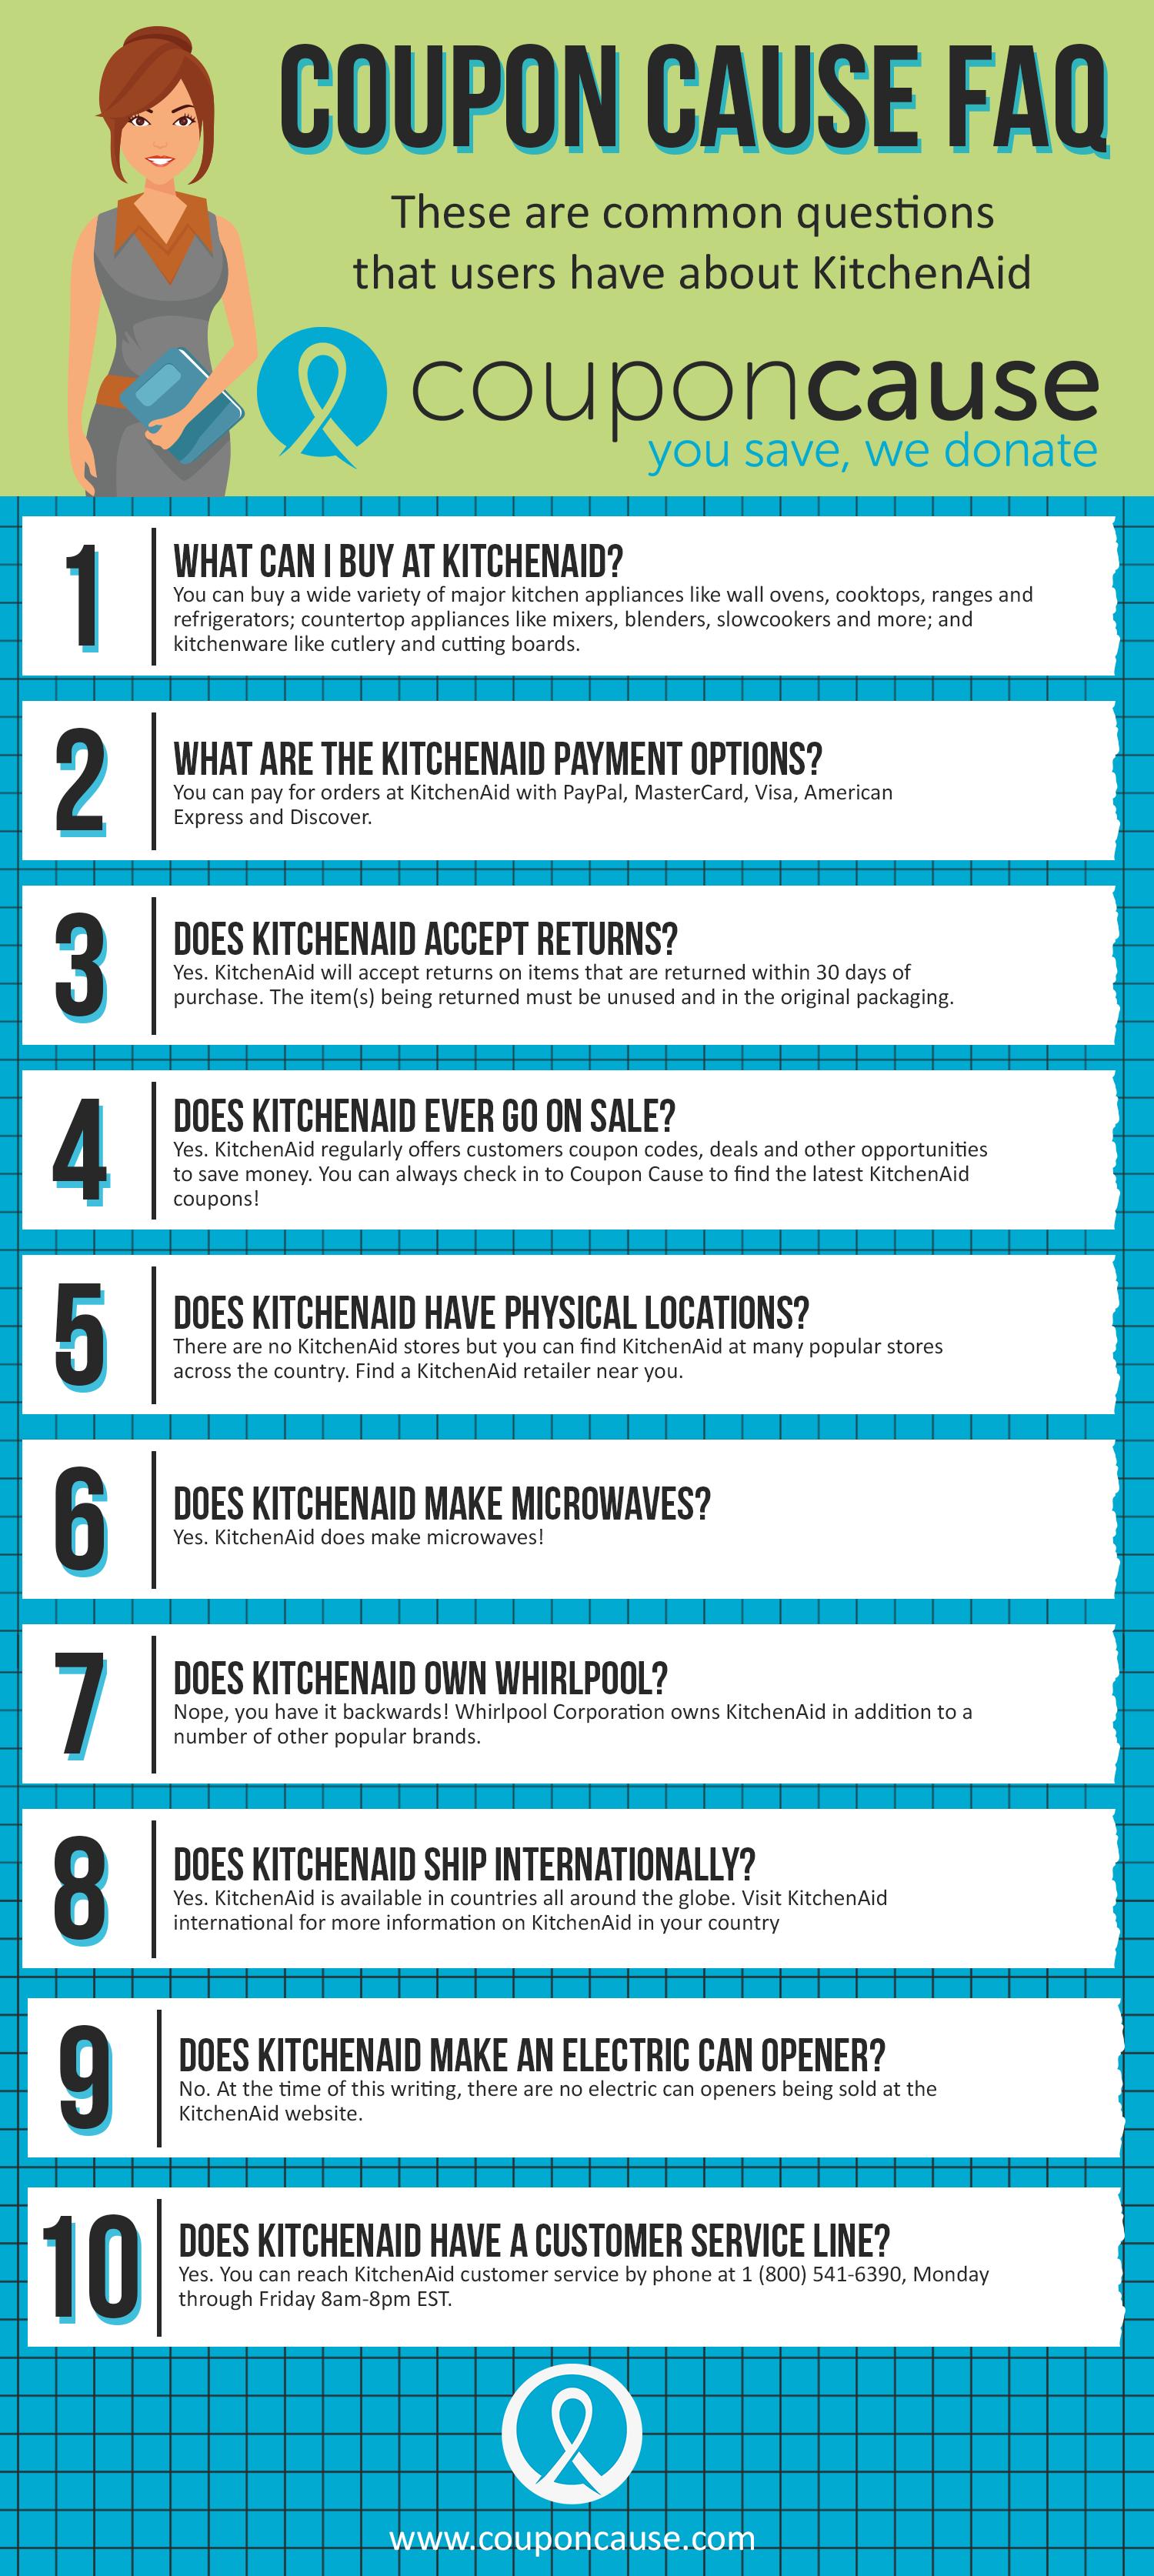 KitchenAid Coupon Cause FAQ (C.C. FAQ)